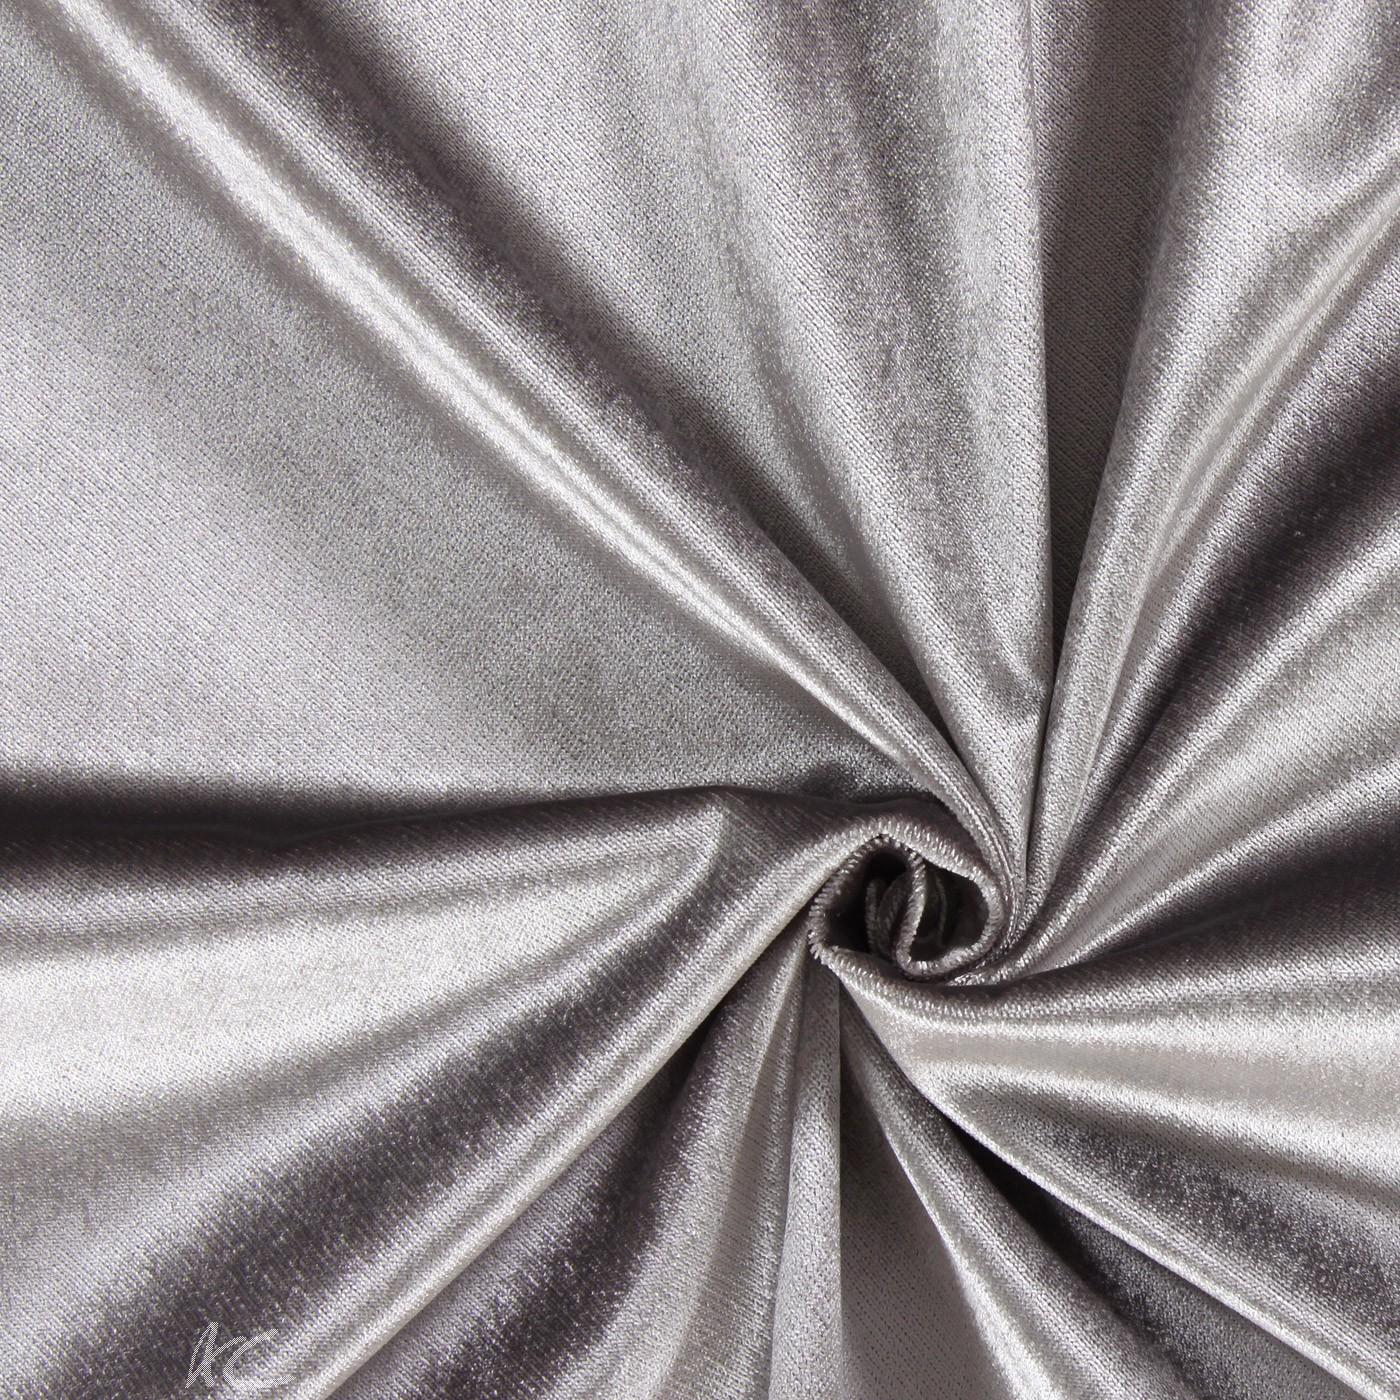 Prestigious Textiles Tanomah Batu Pewter Made to Measure Curtains